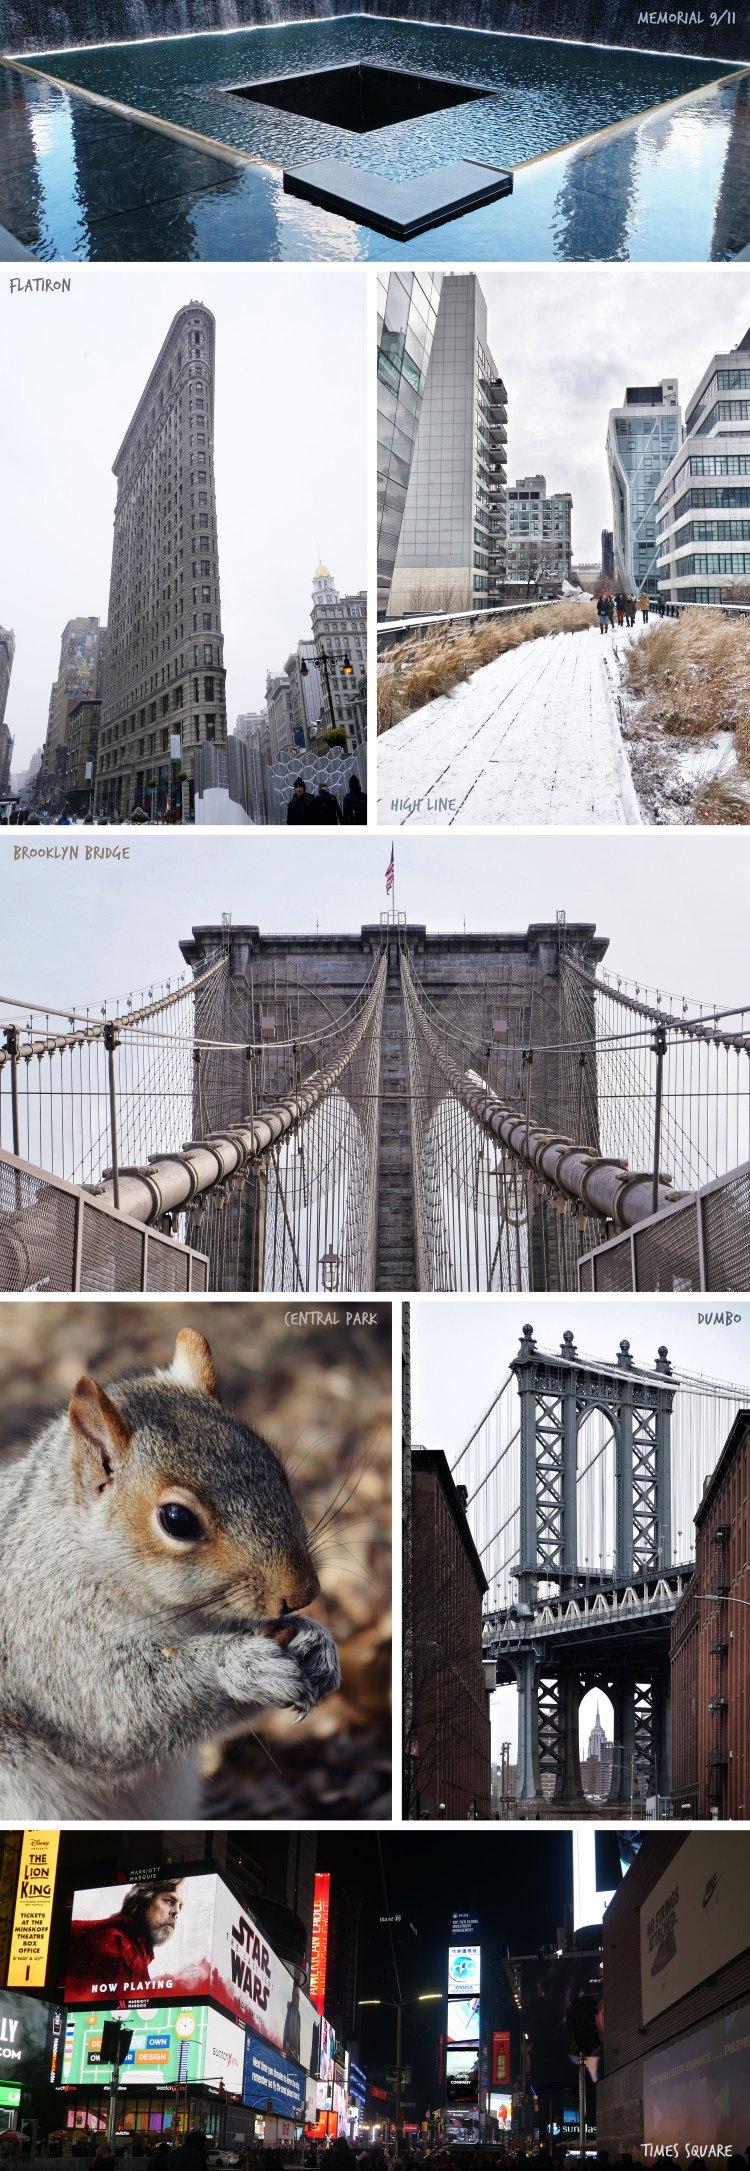 New York City Gratuit